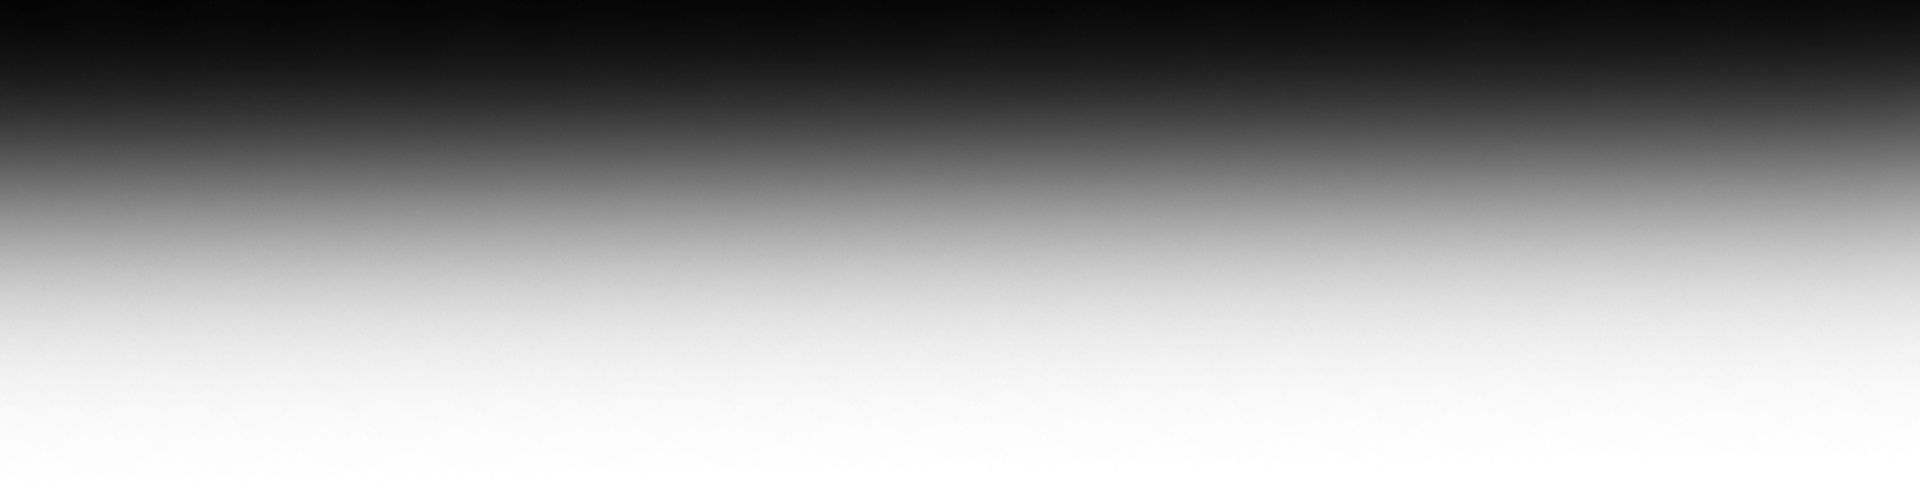 131-1318775_transparent-bg-black-black-s